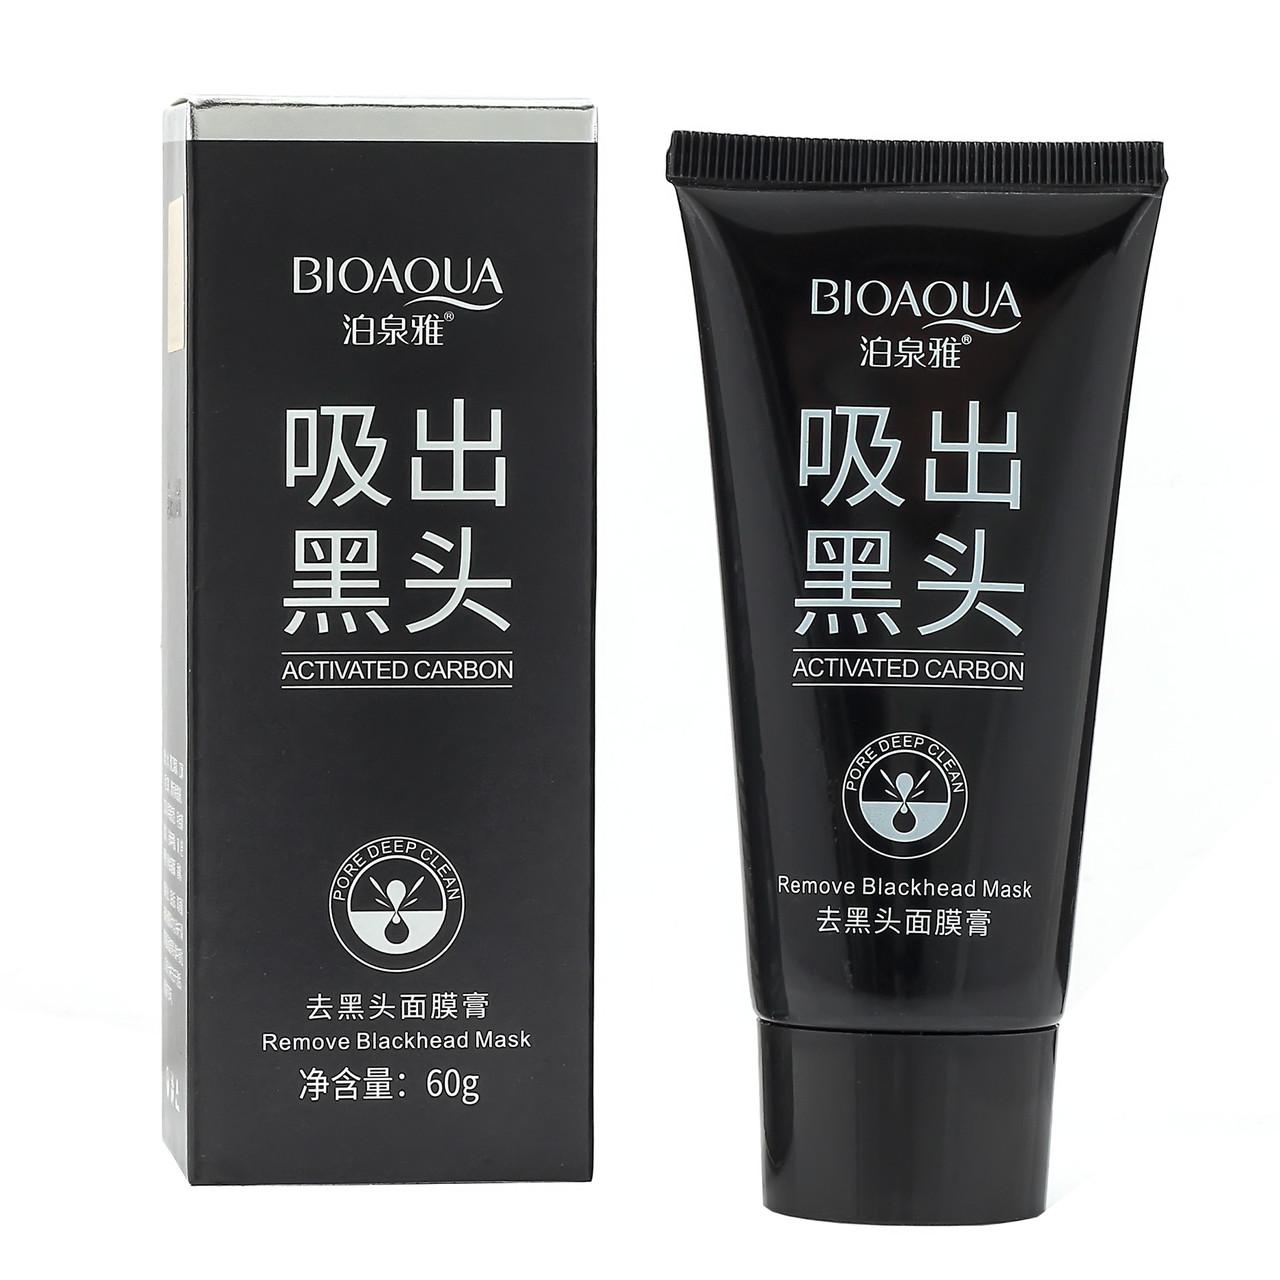 Черная маска-пленка для лица BioАqua Activated Carbon, 60 г